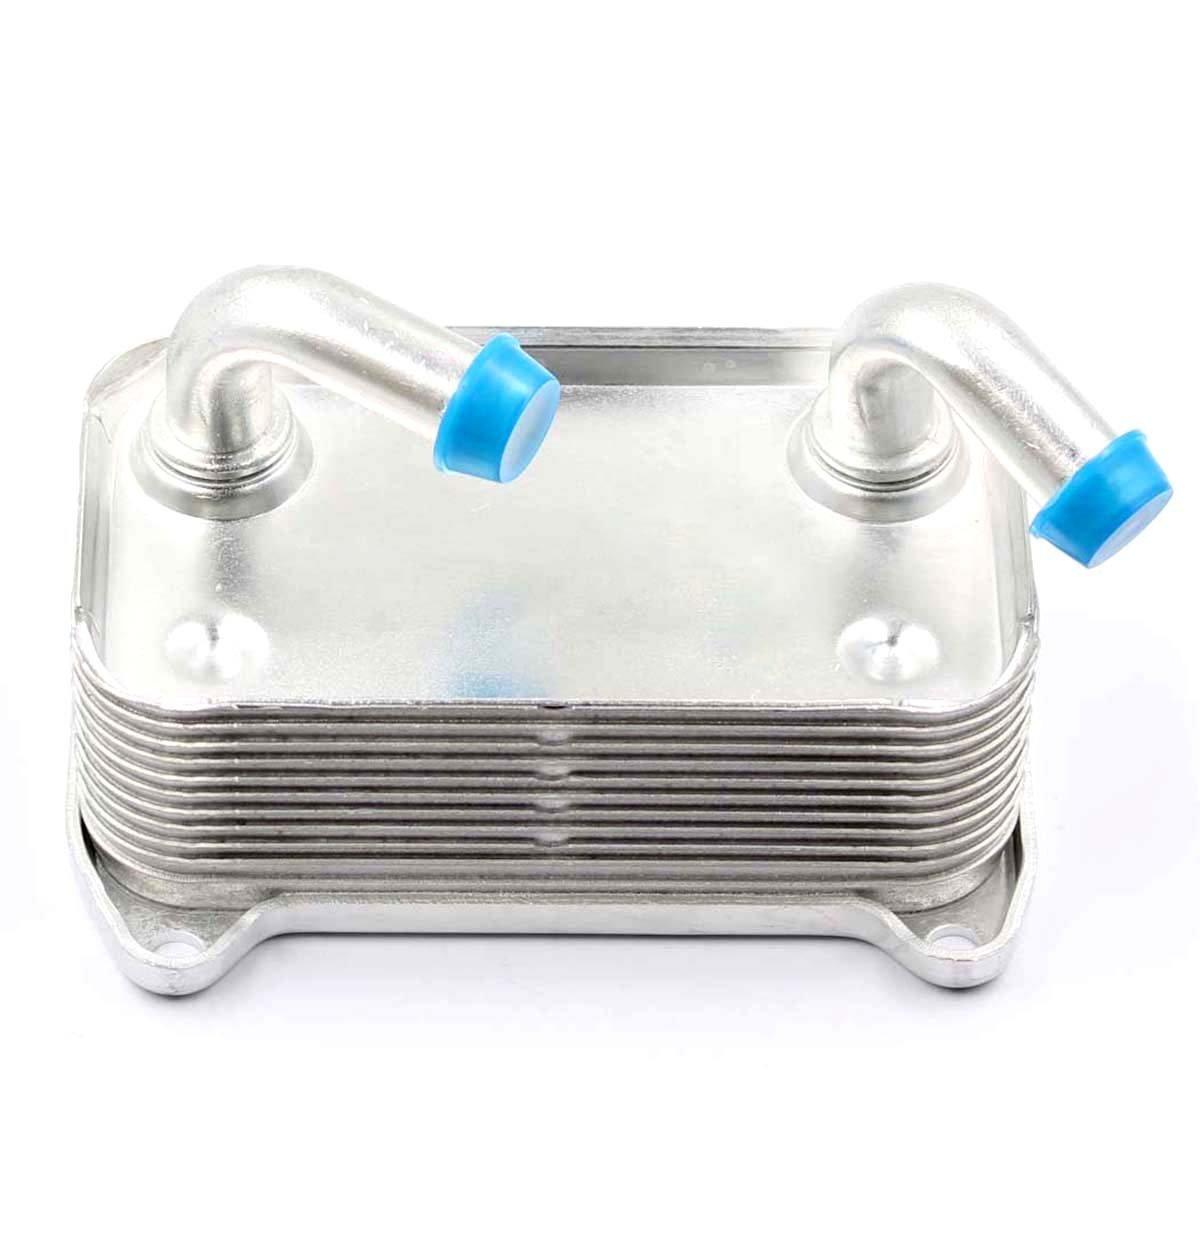 GooDeal Oil Cooler 9496495 for Volvo S40 V40 1.6L 1.8L 1.9T T4 2.0L T5 2.4L